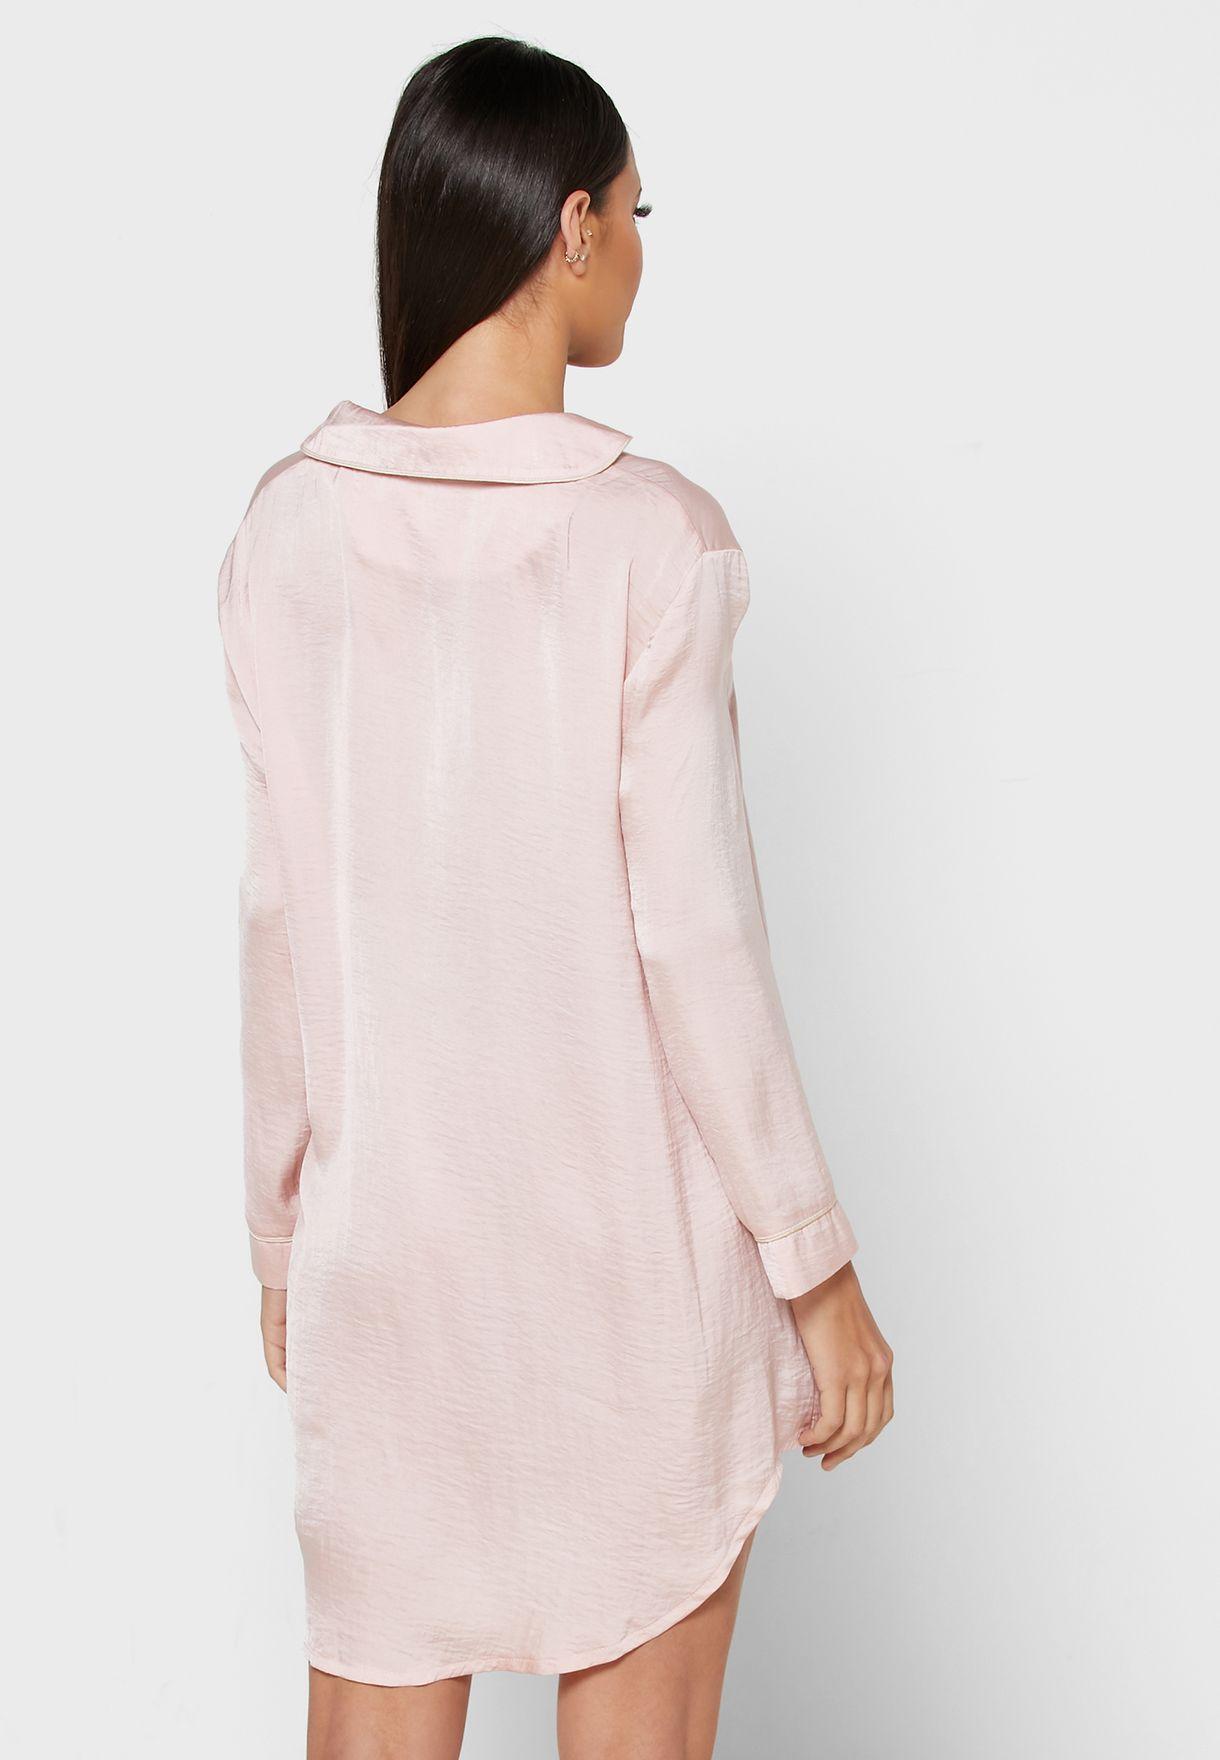 Contrast Piping Shirt Nightdress